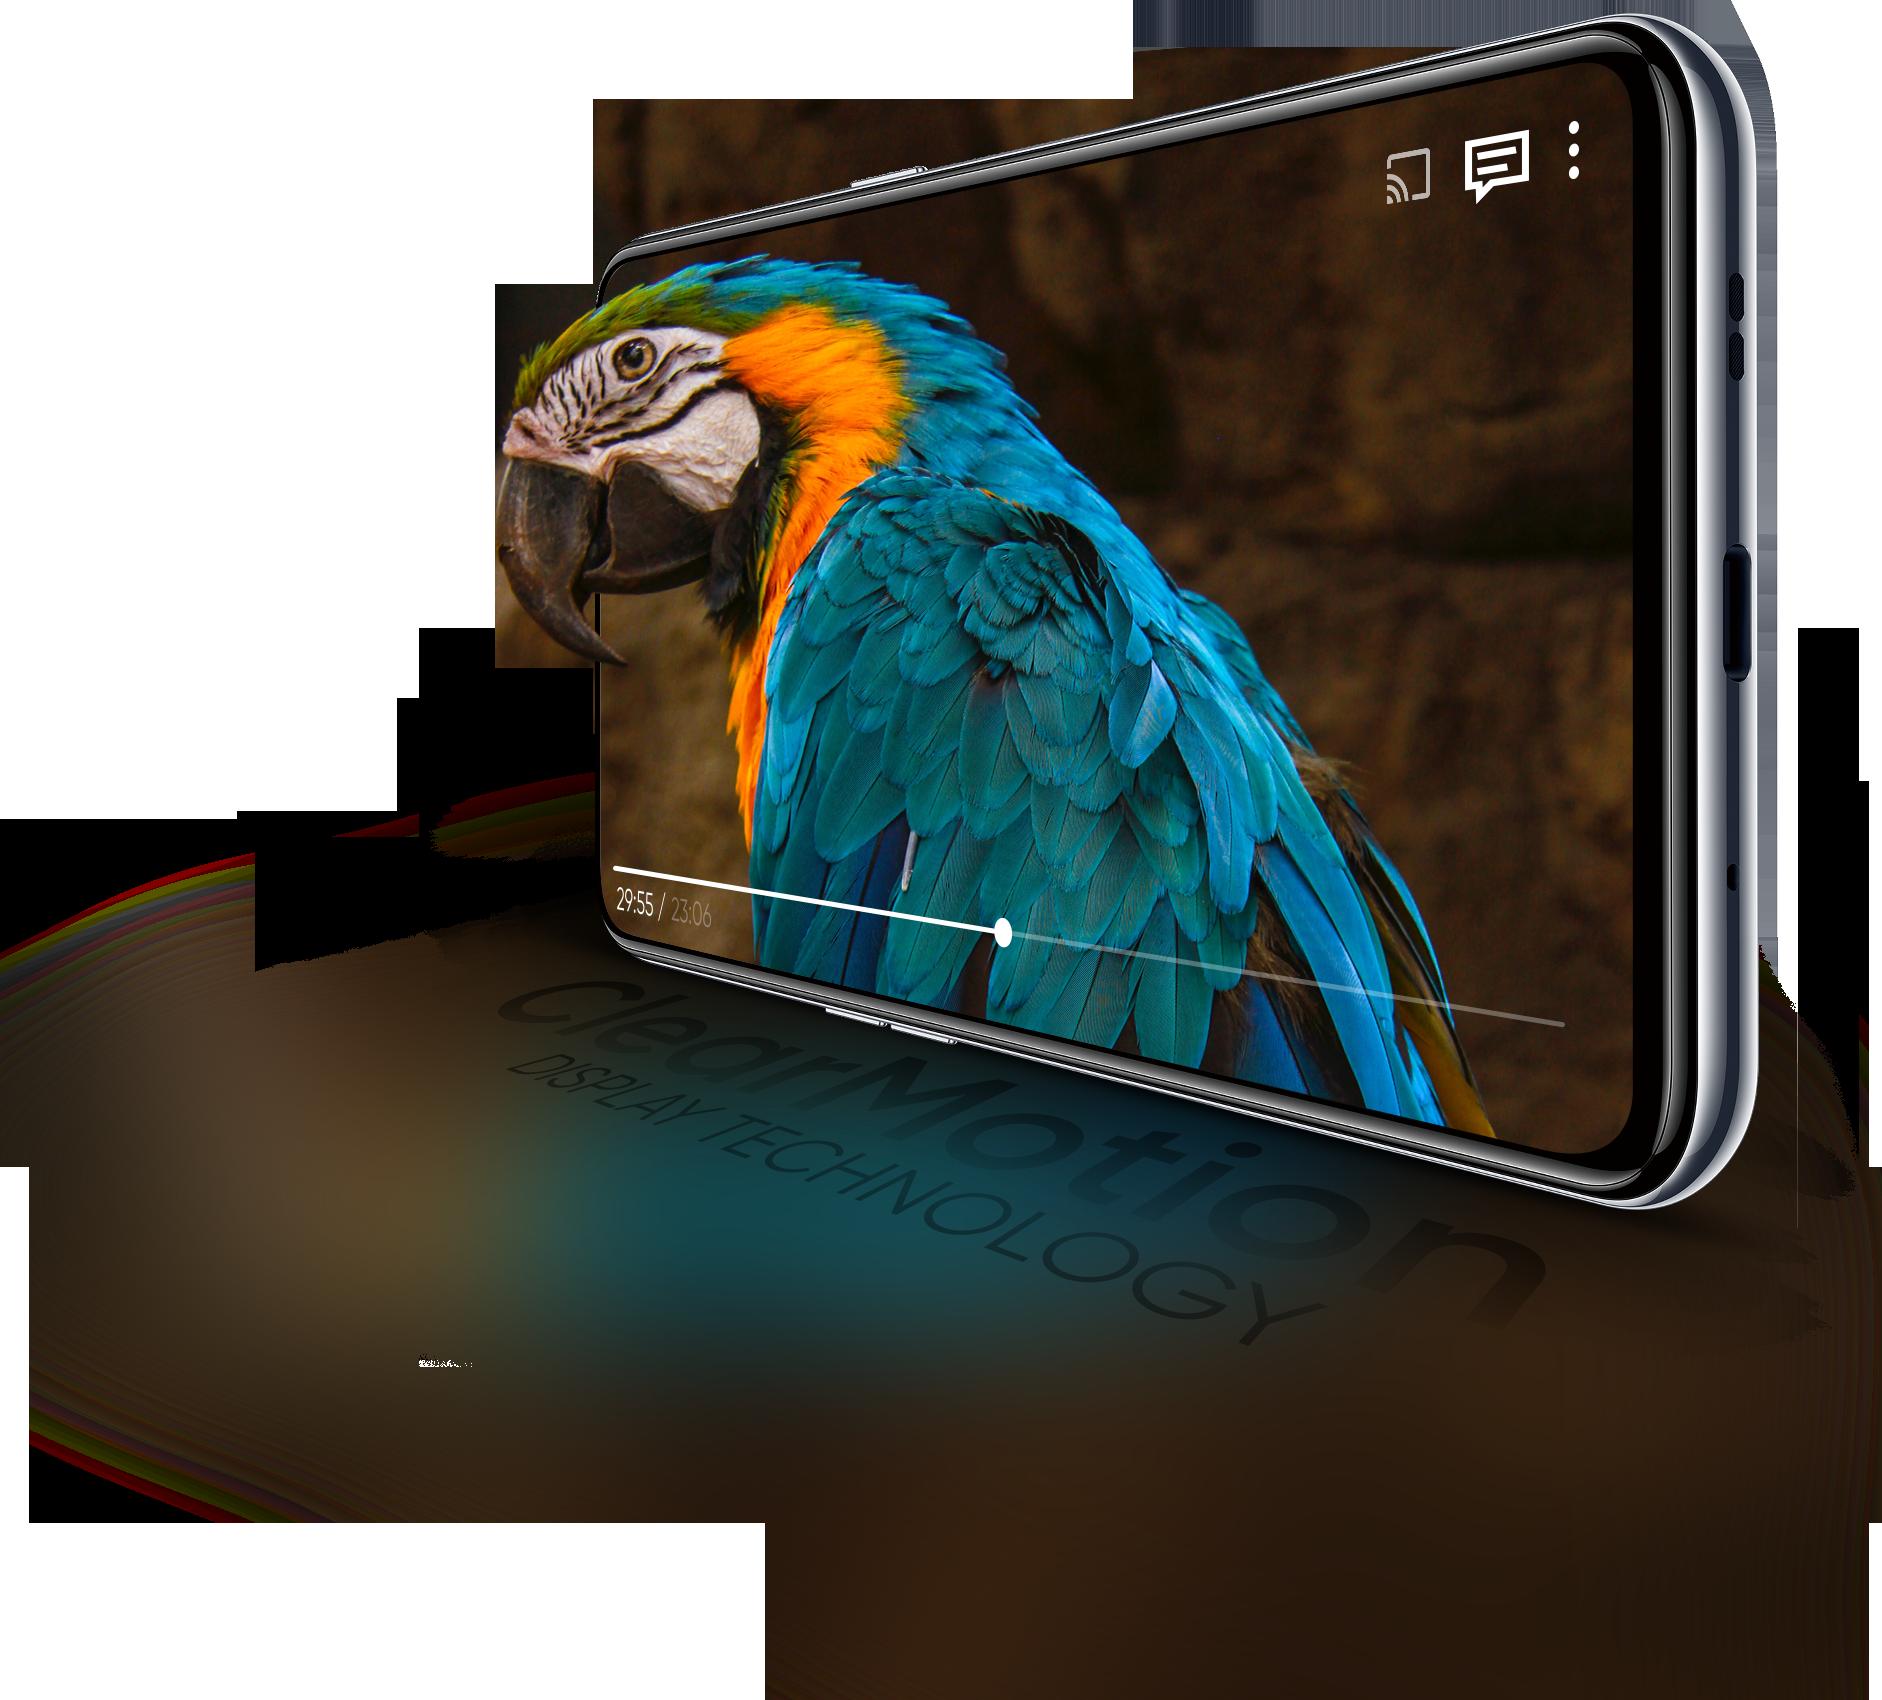 MediaTek MiraVision HDR Video Playback